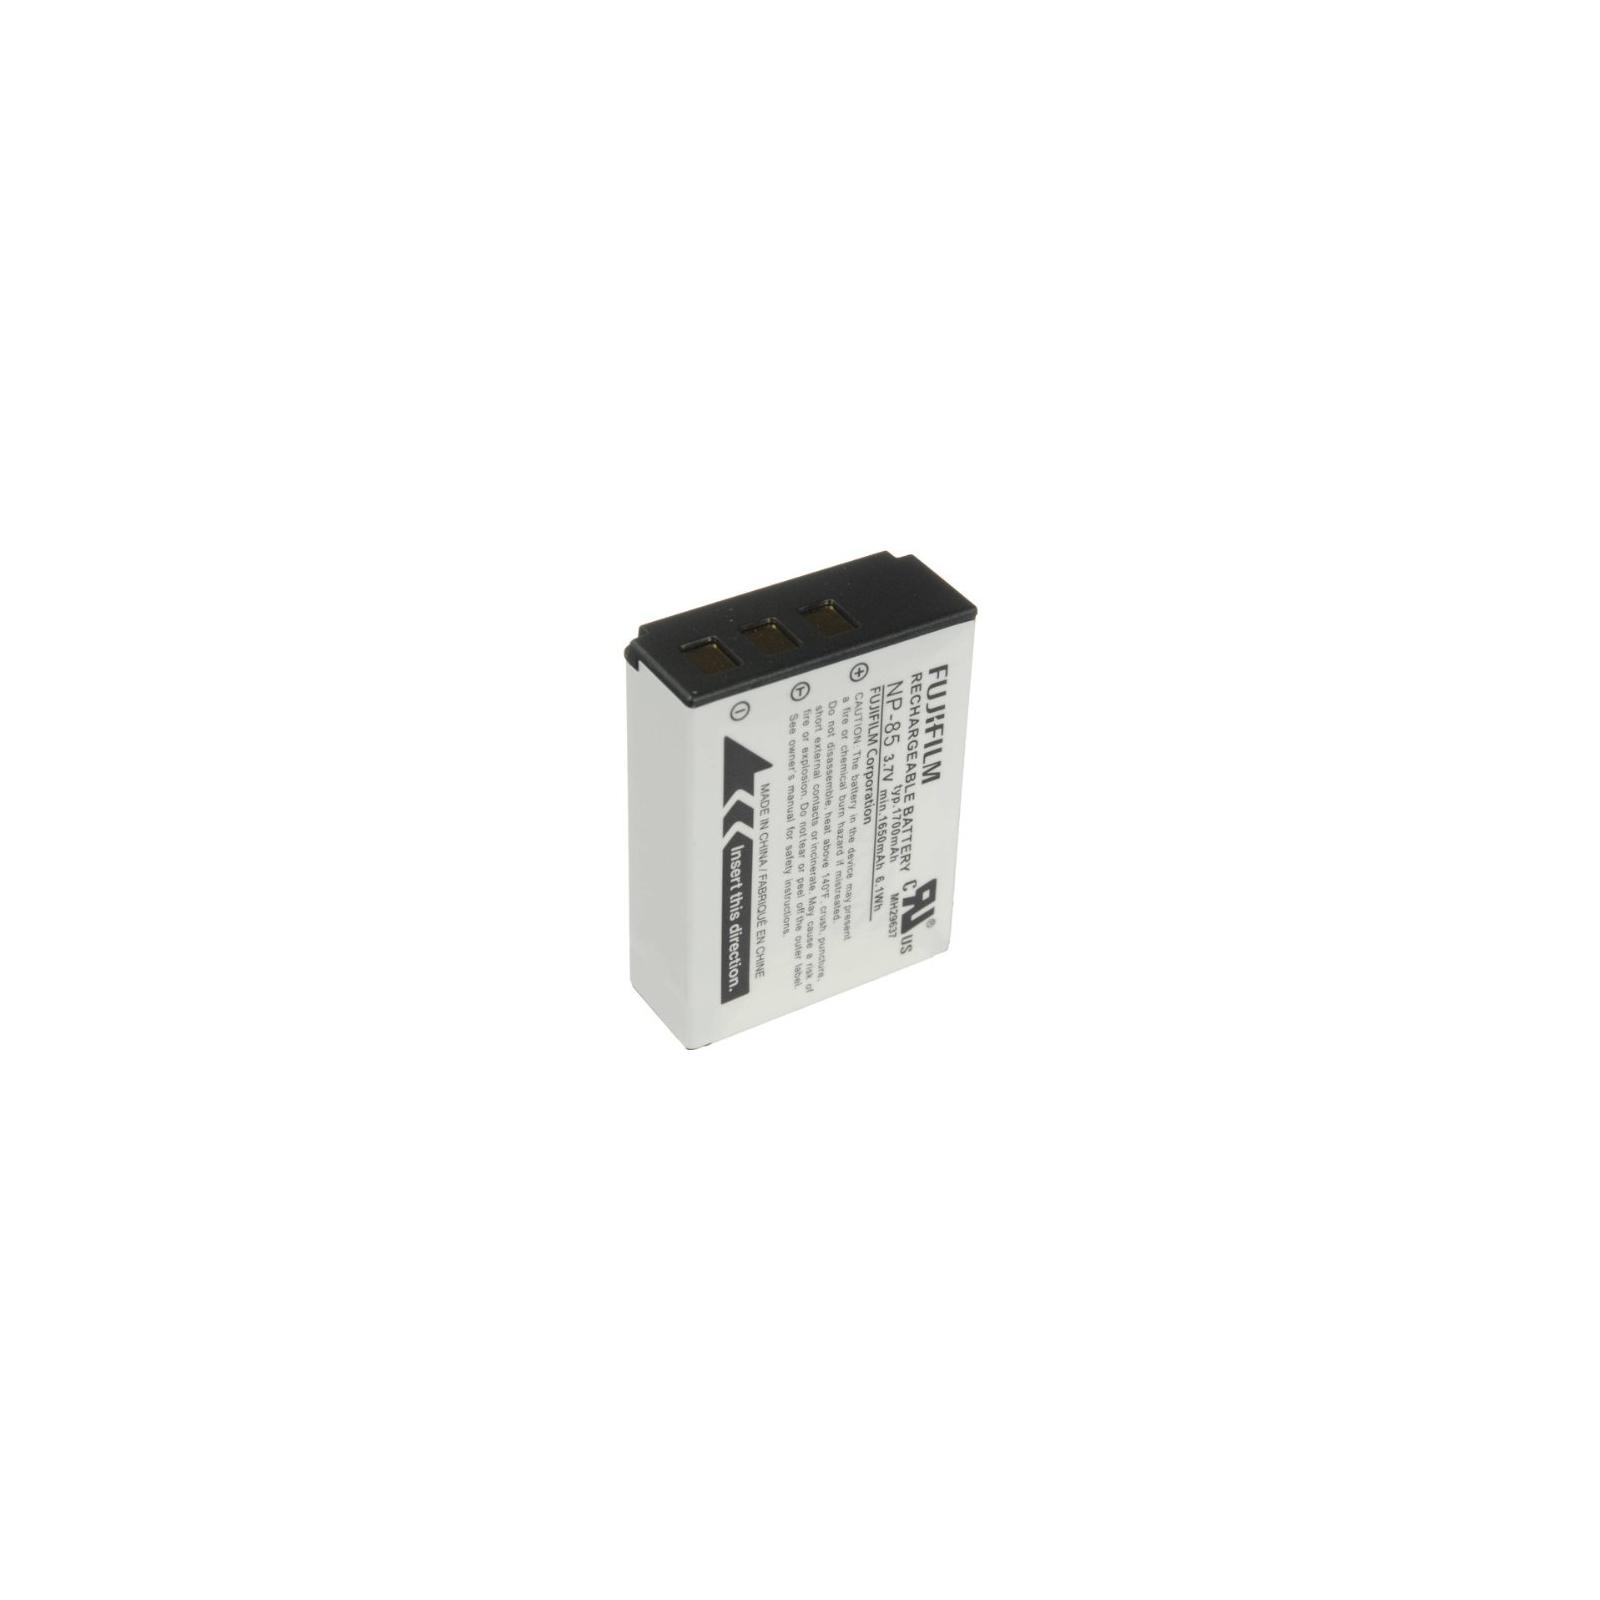 Аккумулятор к фото/видео Fujifilm NP-85-E (16226682) изображение 2